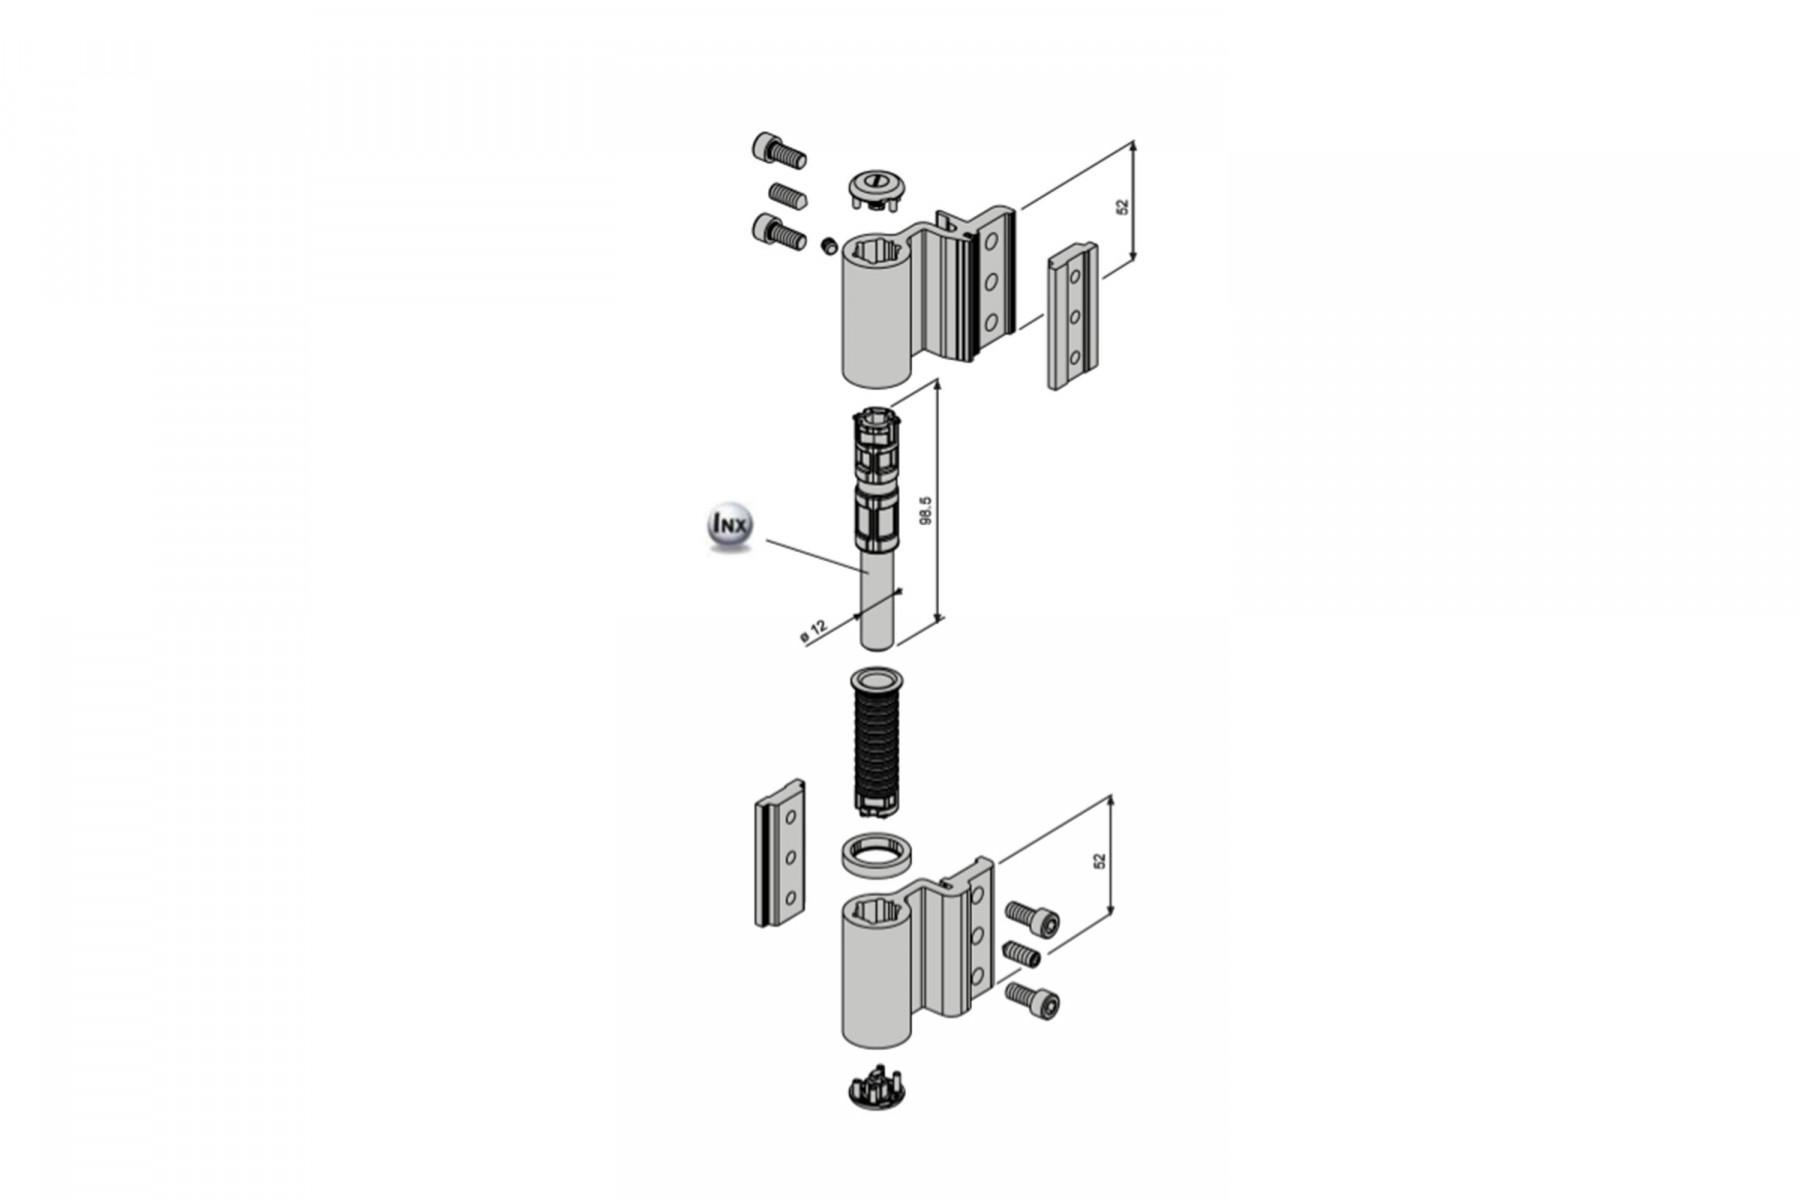 Paumelle Velox Top alu 5500I FAPIM 2 lames EL 17mm - Gris 05 - 5520_05